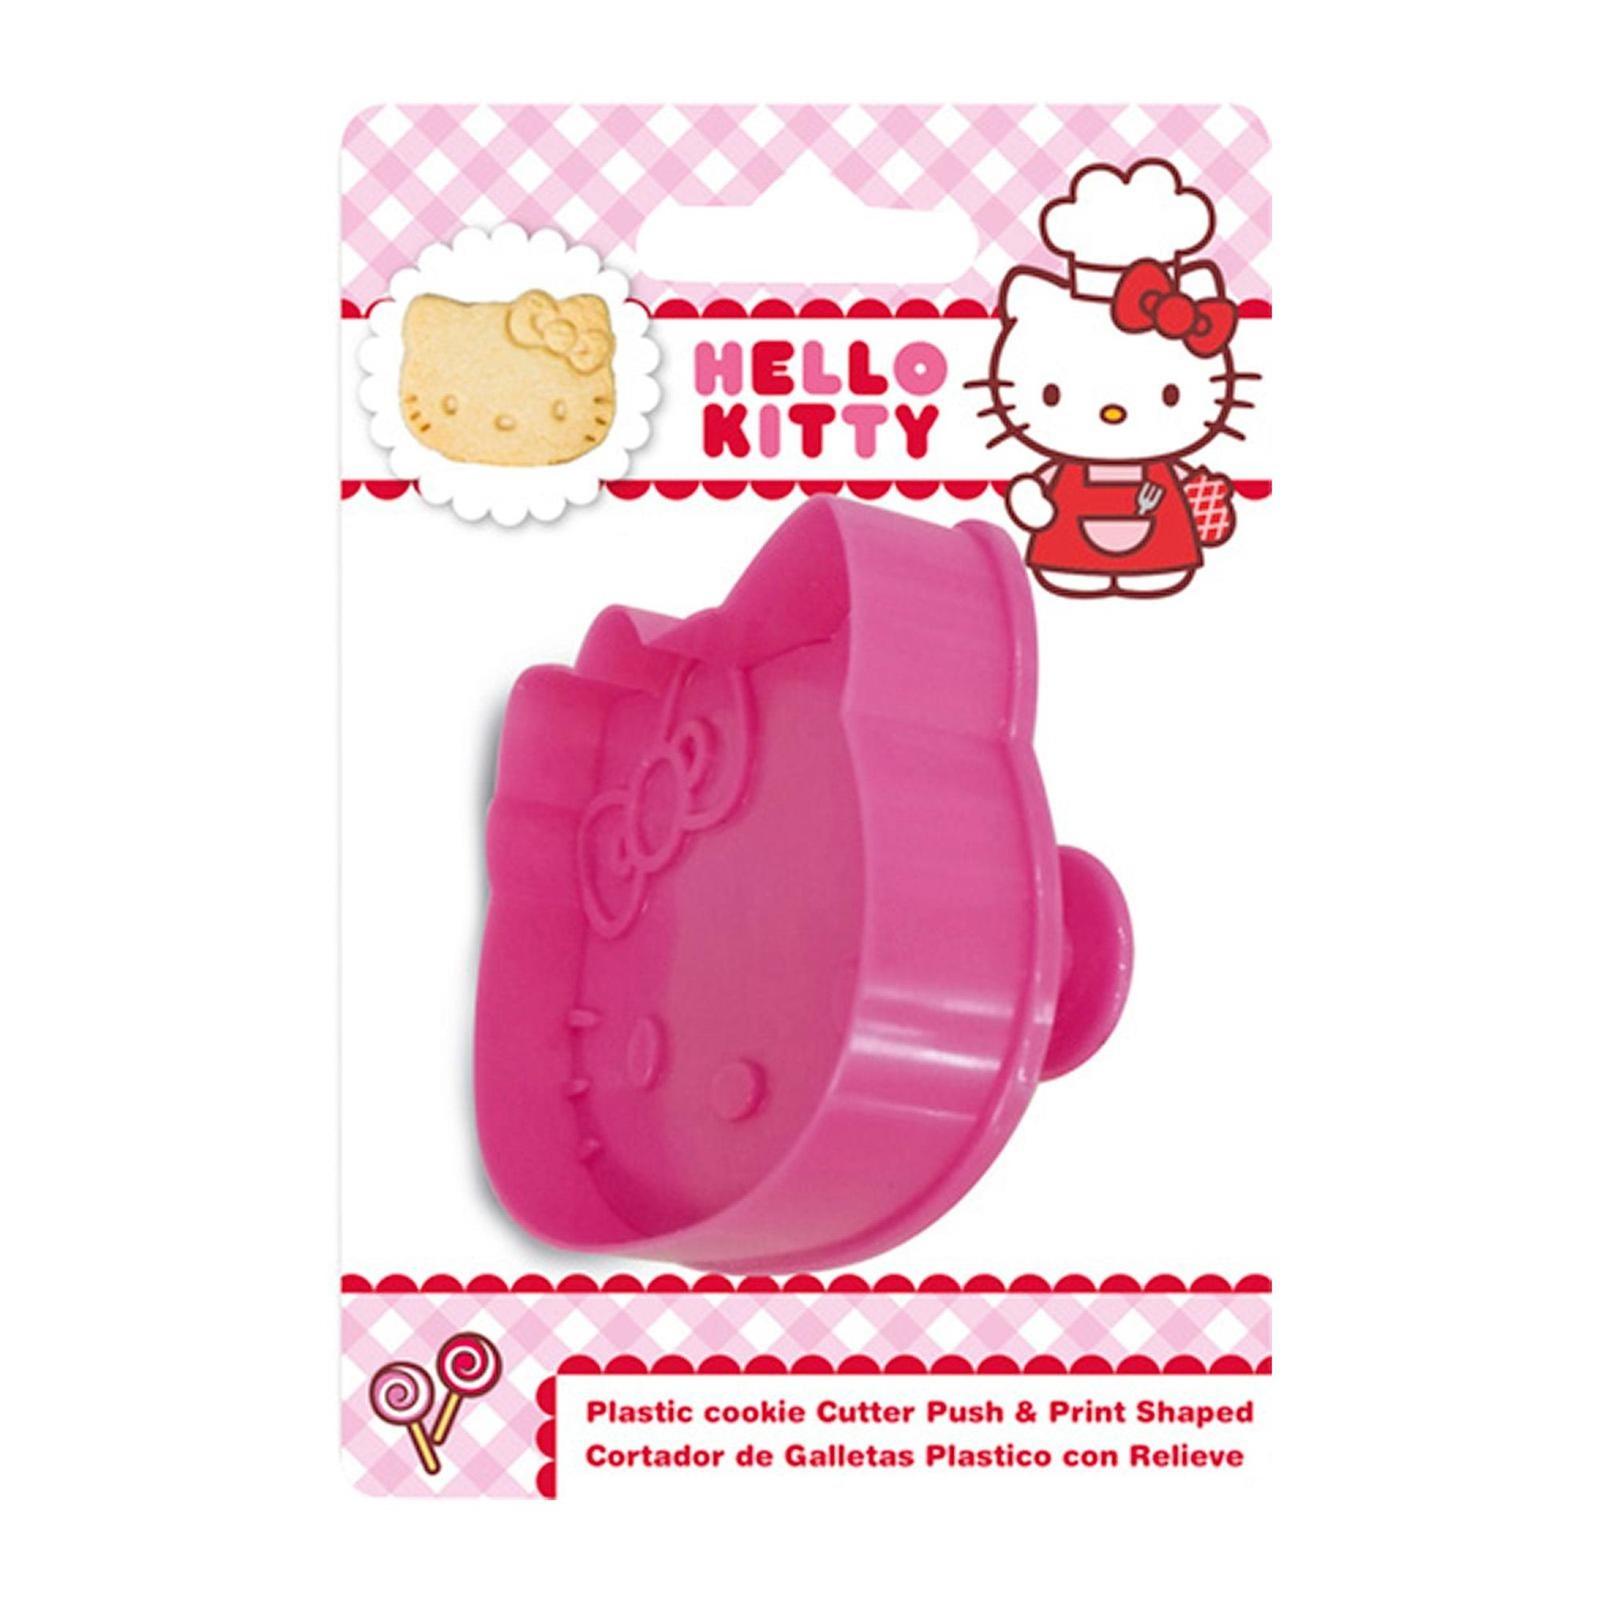 Sanrio Genuine Hello Kitty Head Shapes Baking-Plastic Cutter